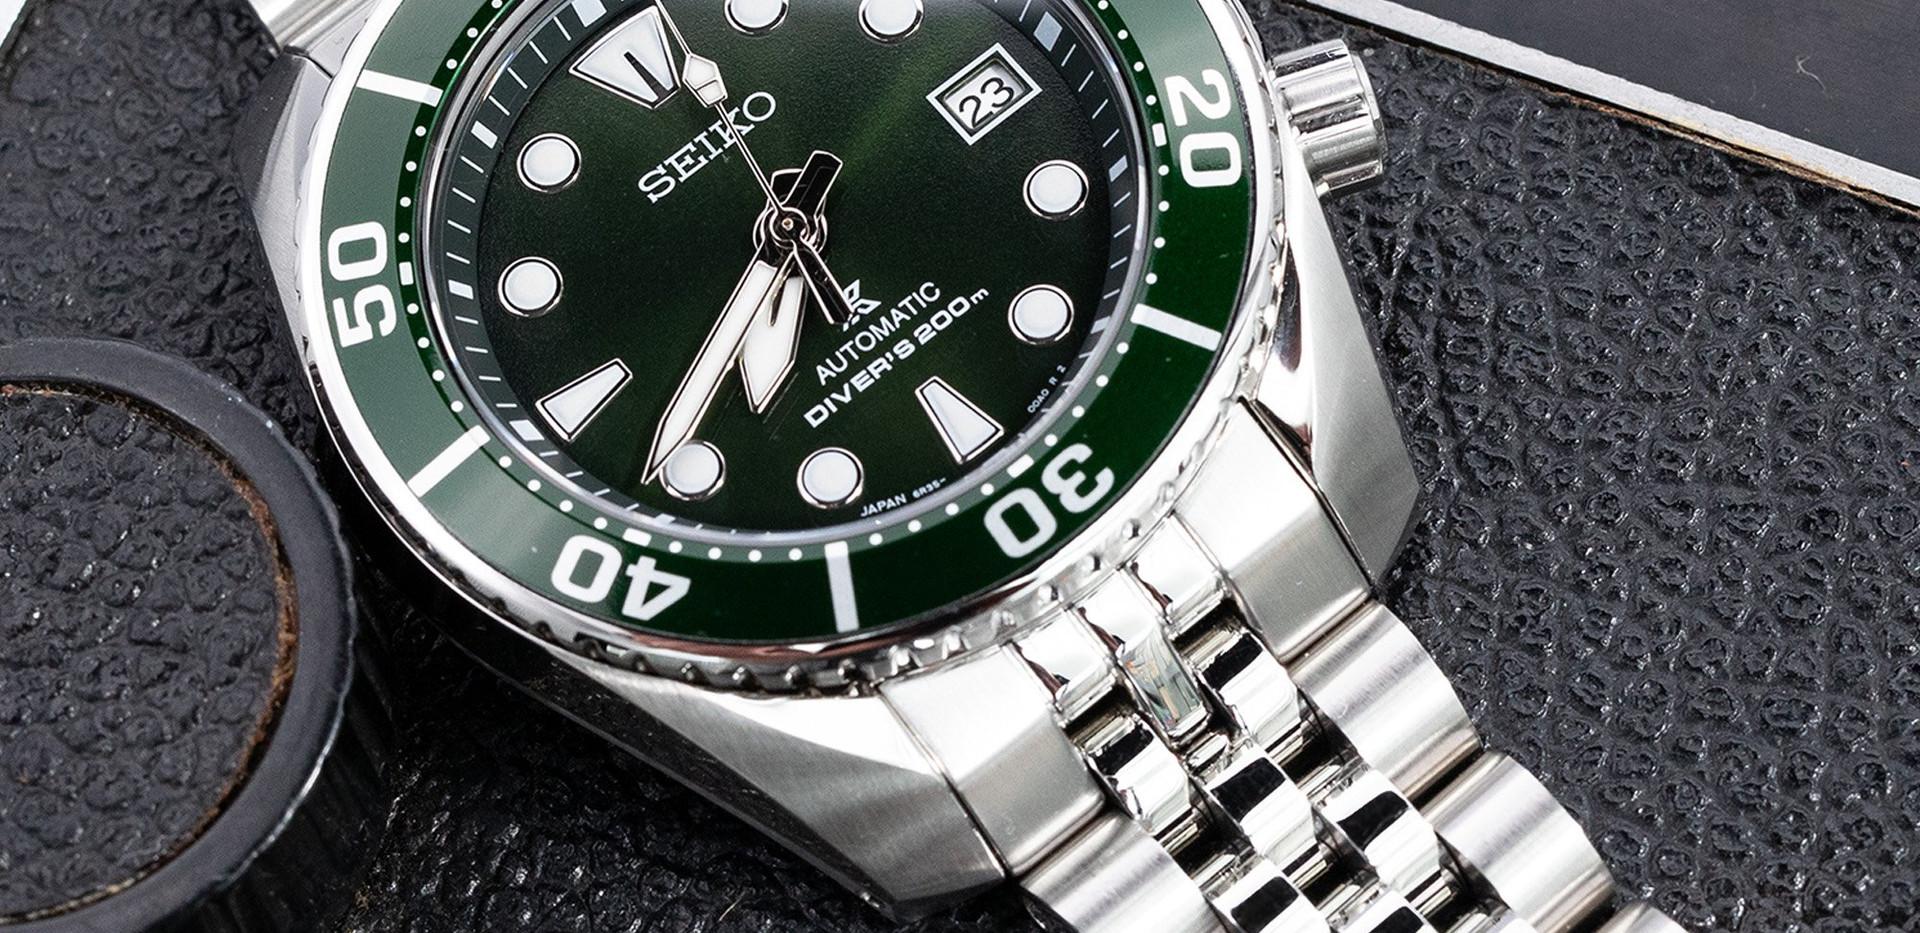 SS201805B057_Seiko-SPB103-Green-Sumo-MT_